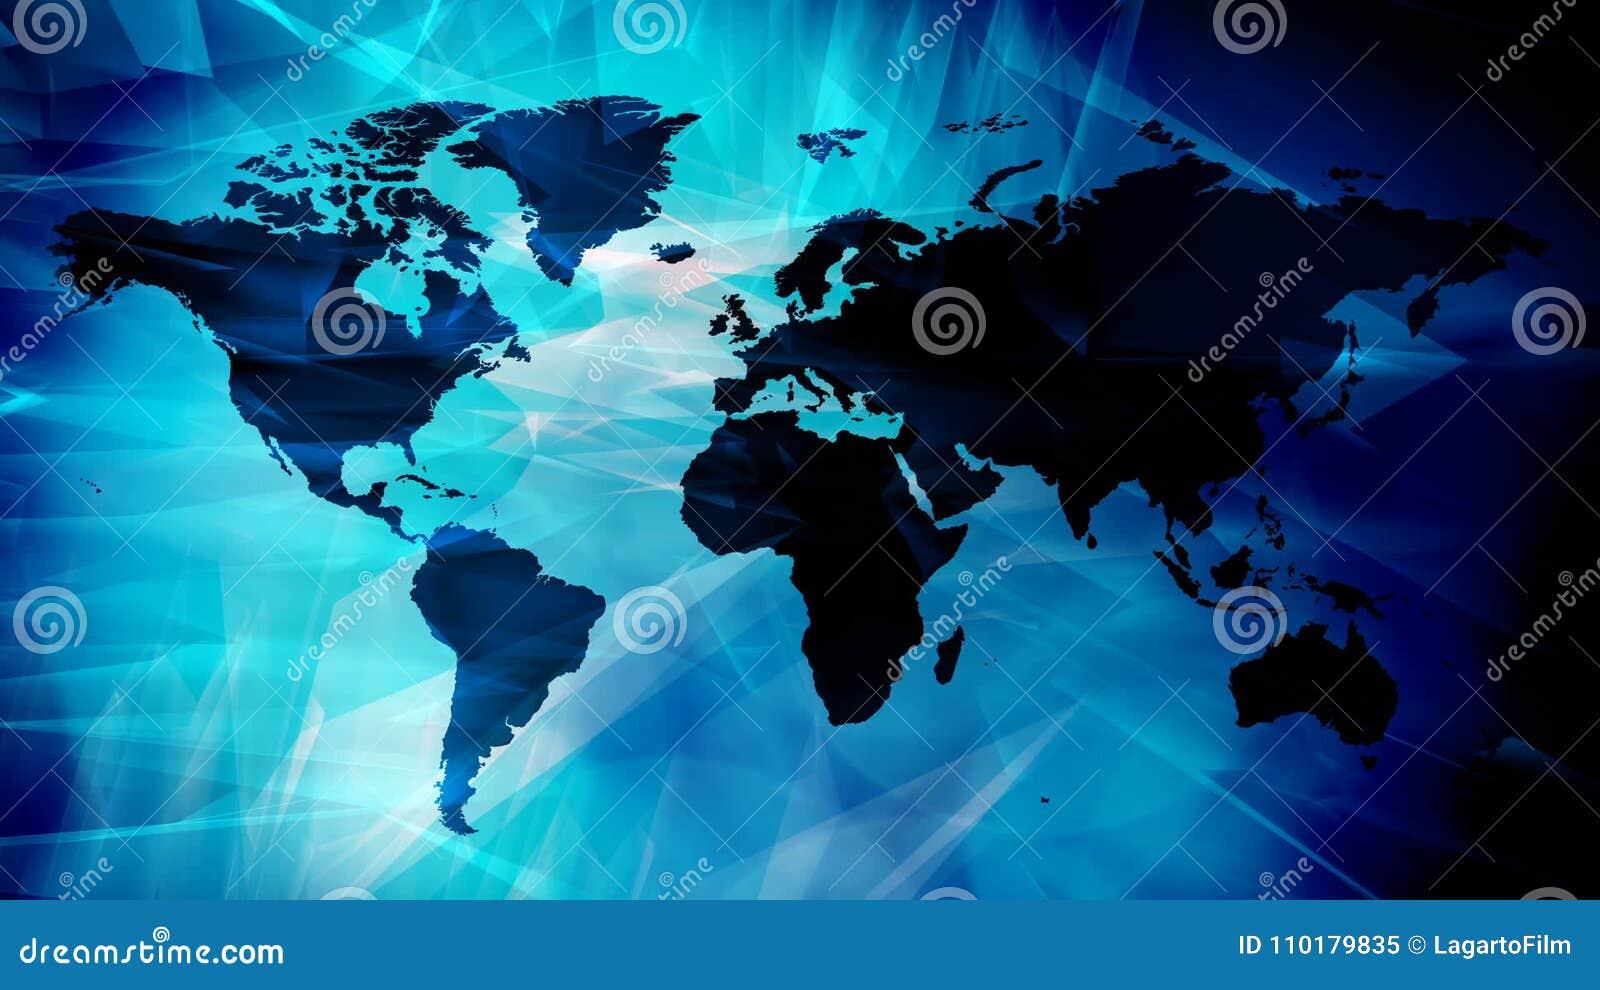 International Business Animated Wallpaper Stock Video